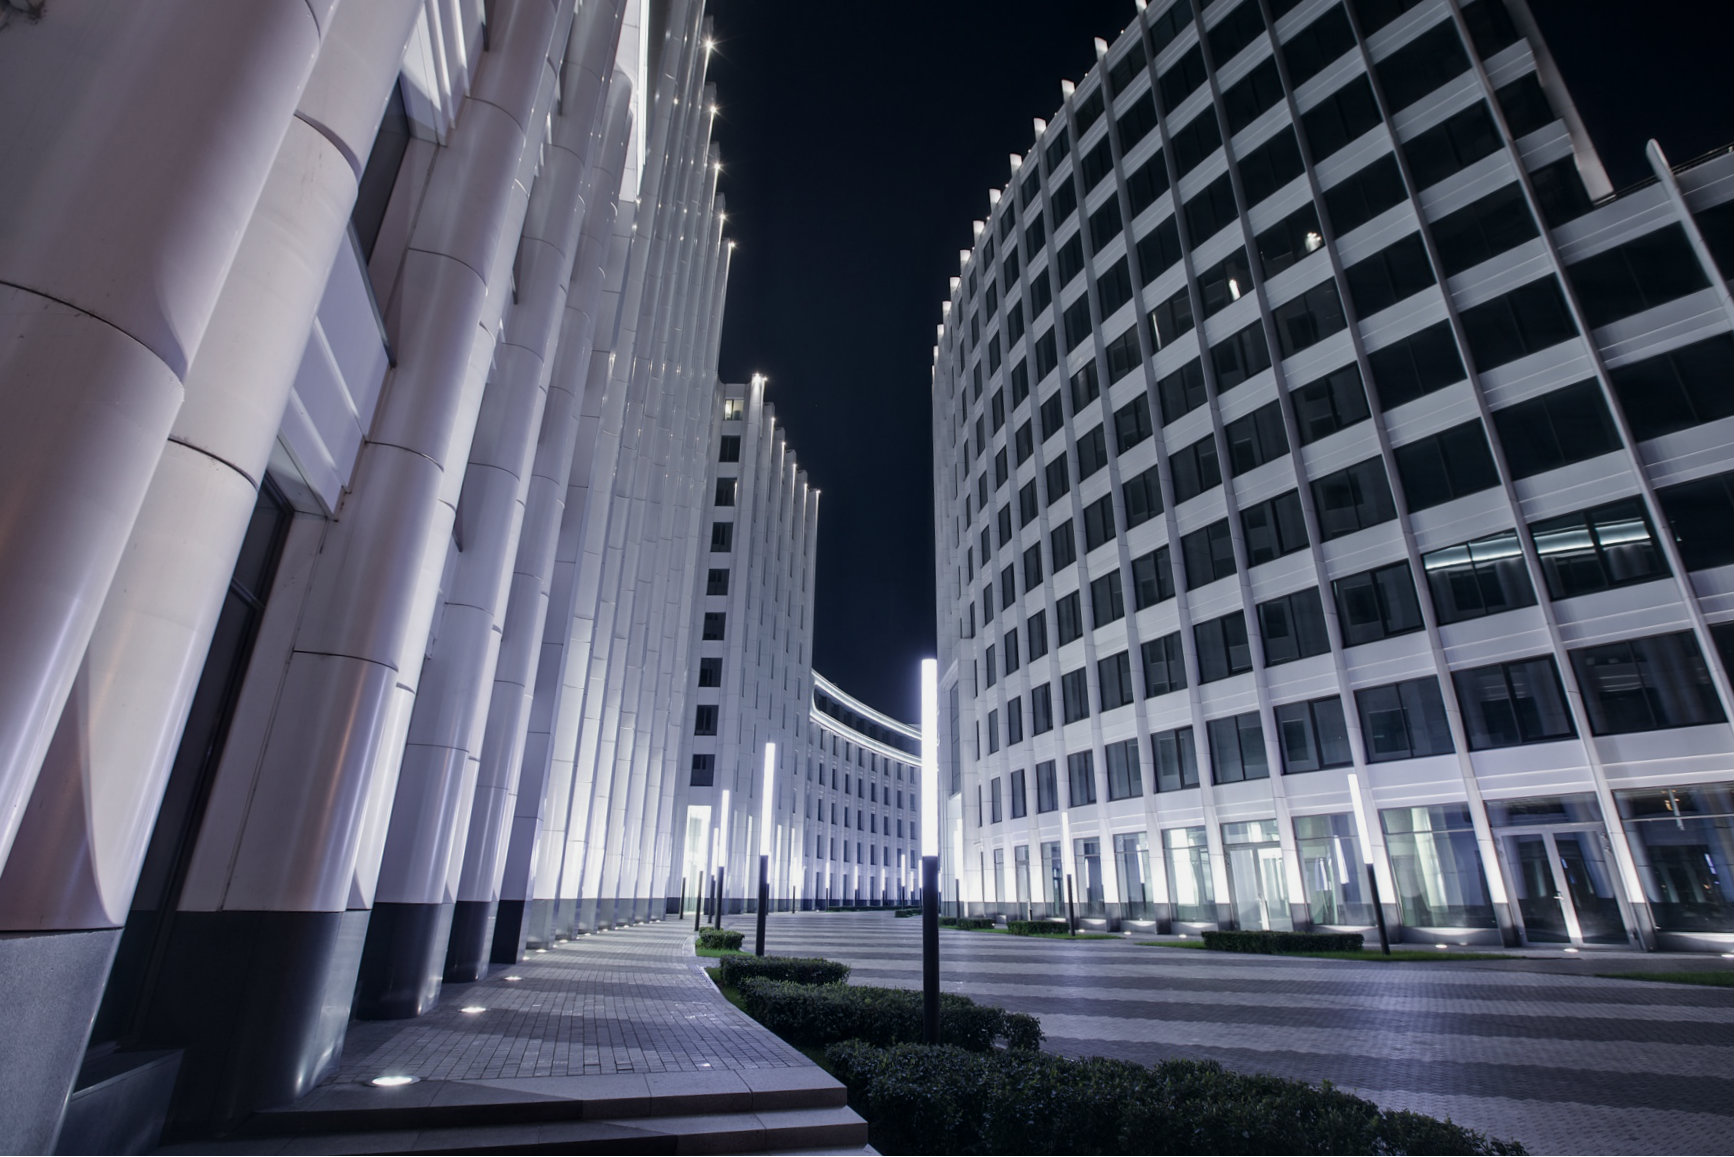 Бизнес центр Аквамарин (фото: аквамарин3.рф)